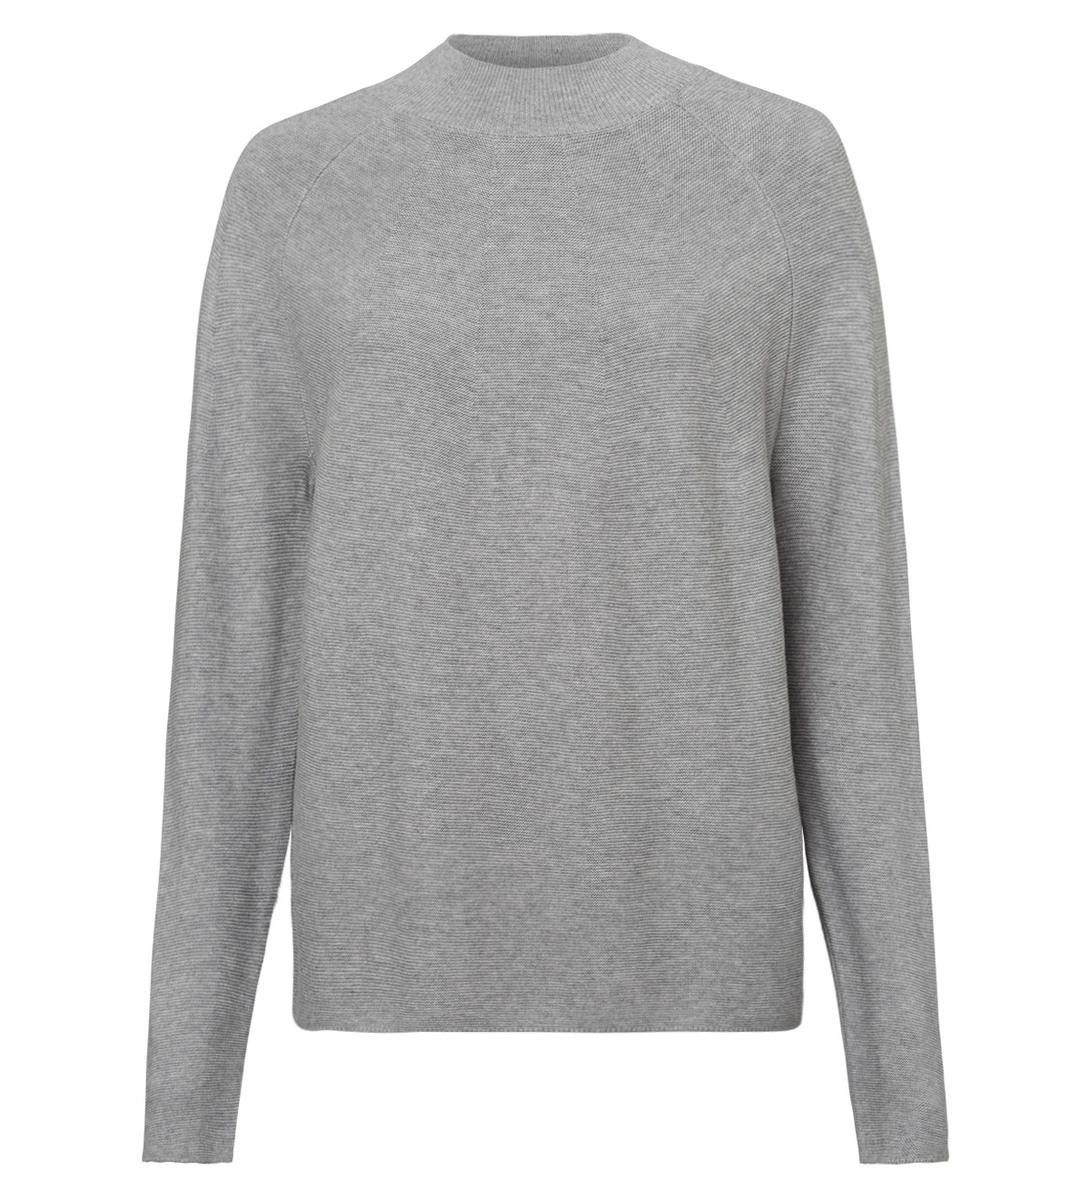 Pullover mit Turtleneck in stone grey